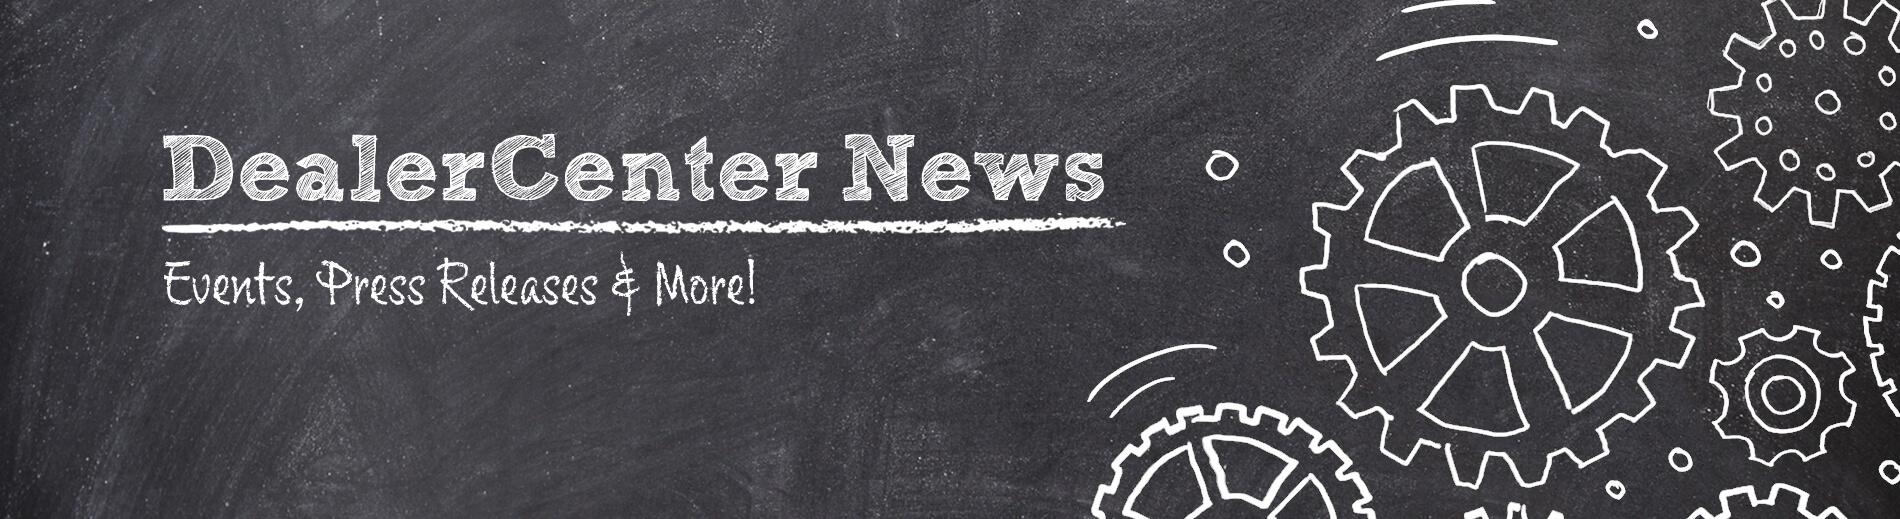 News-Page